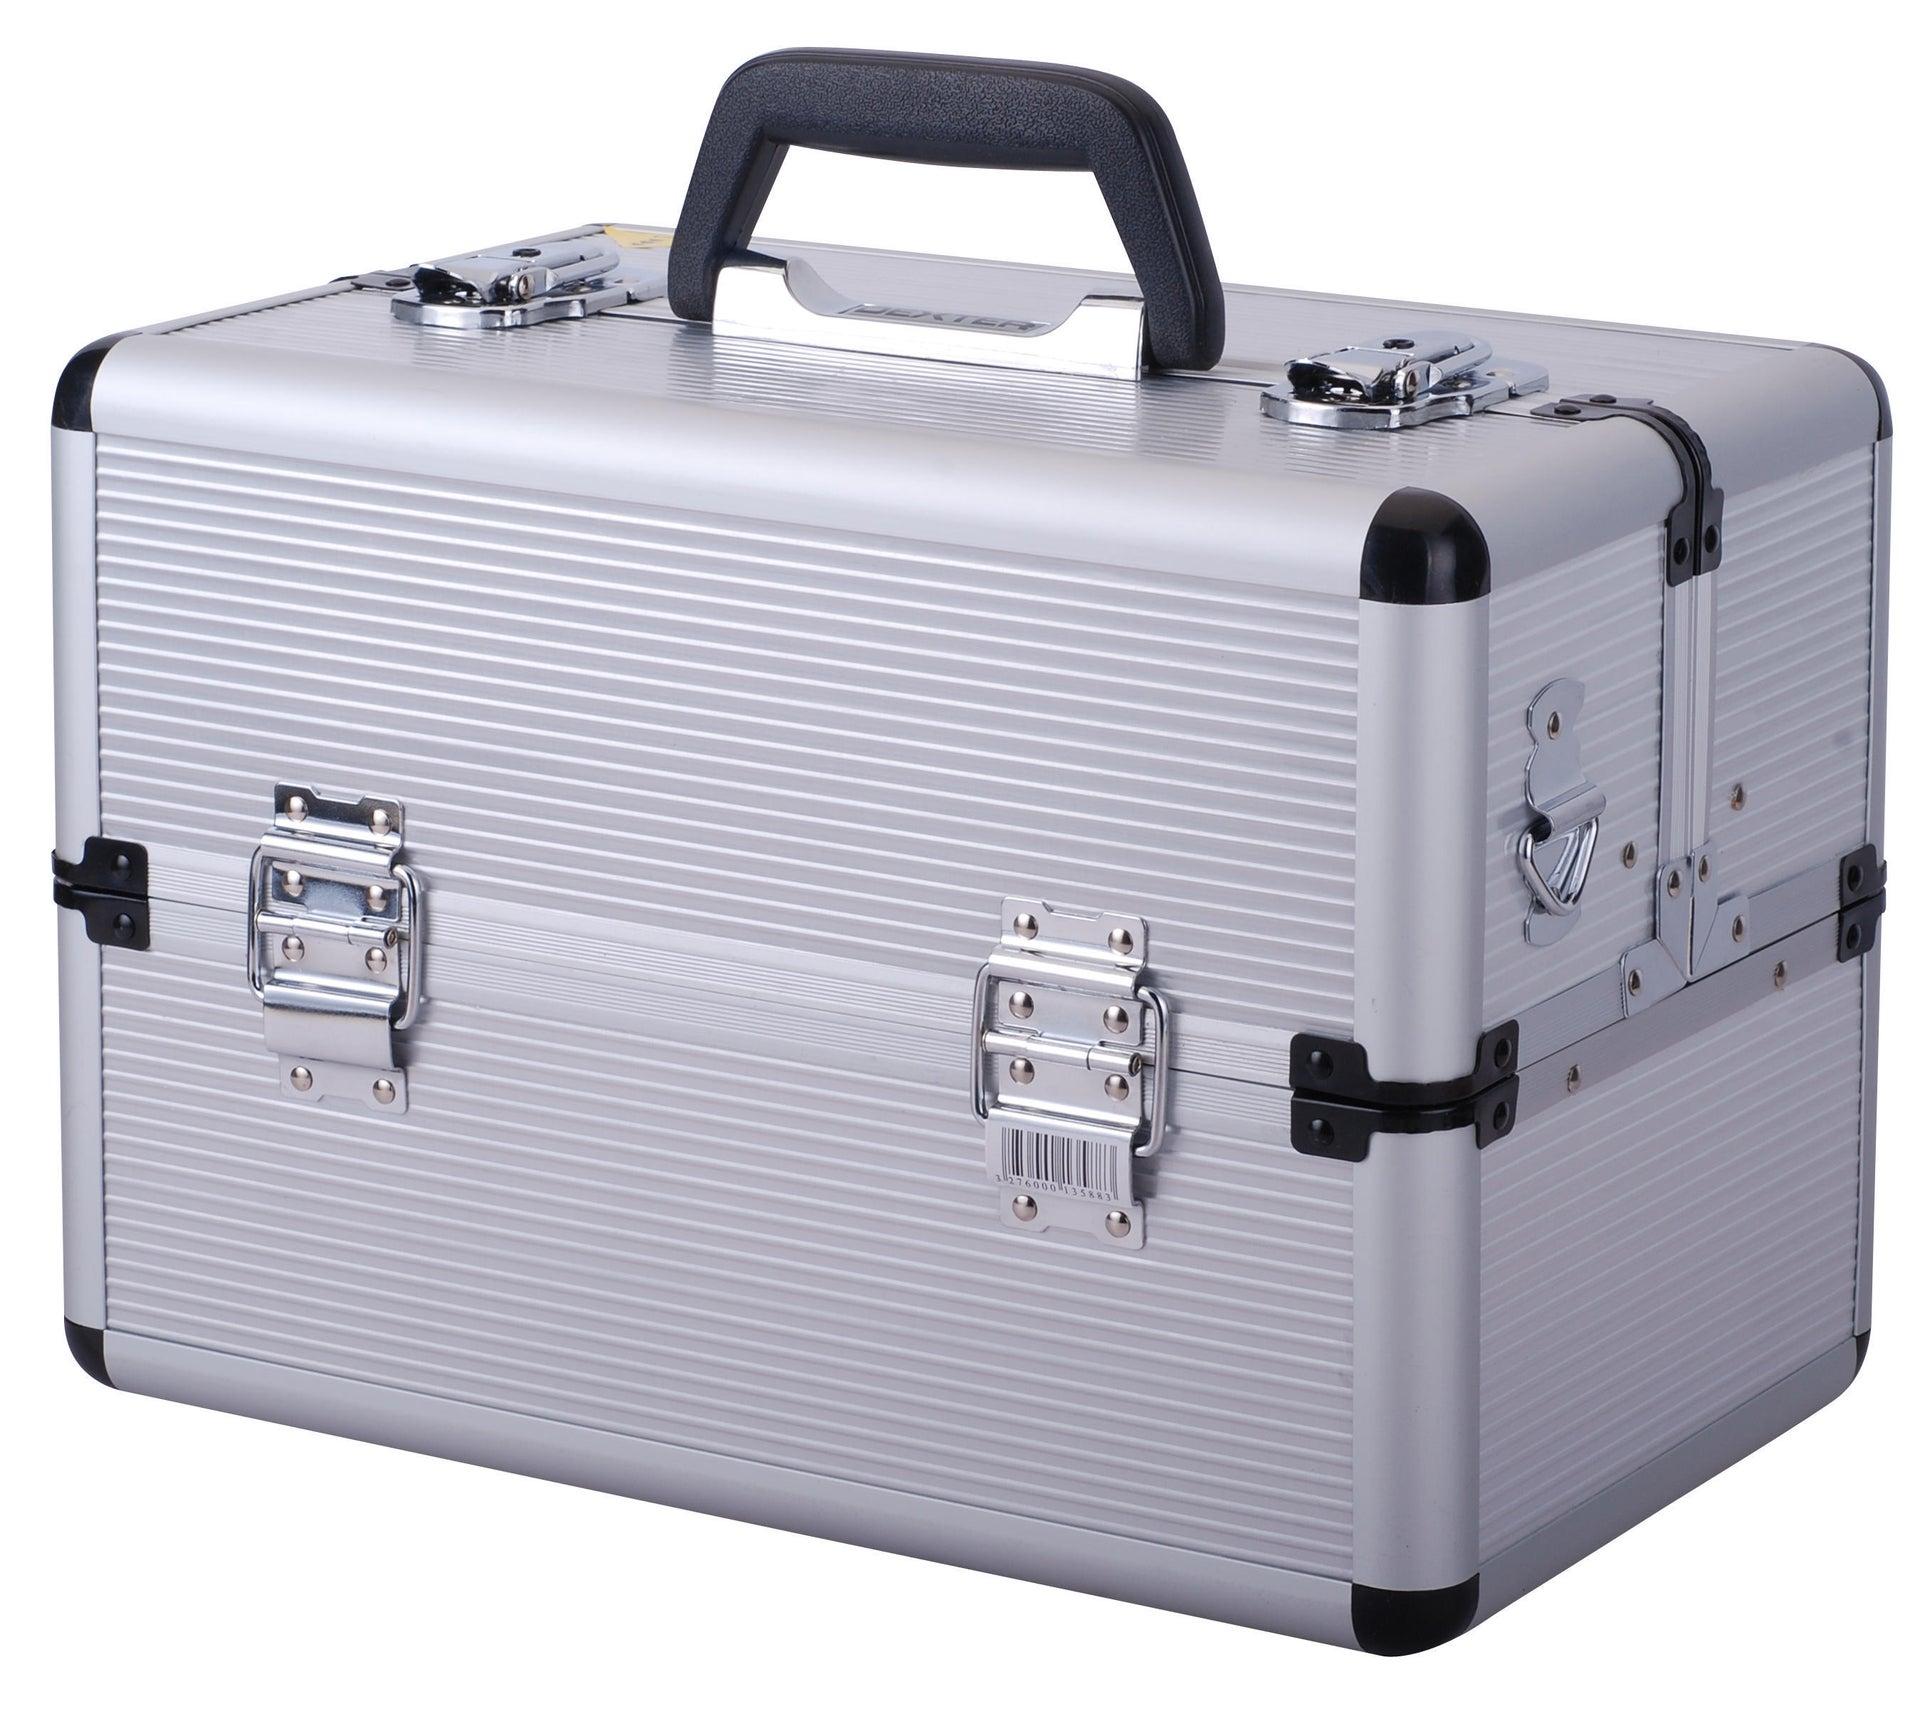 Cassetta attrezzi DEXTER L 22.5 x H 36.5 cm, profondità 250 mm - 6